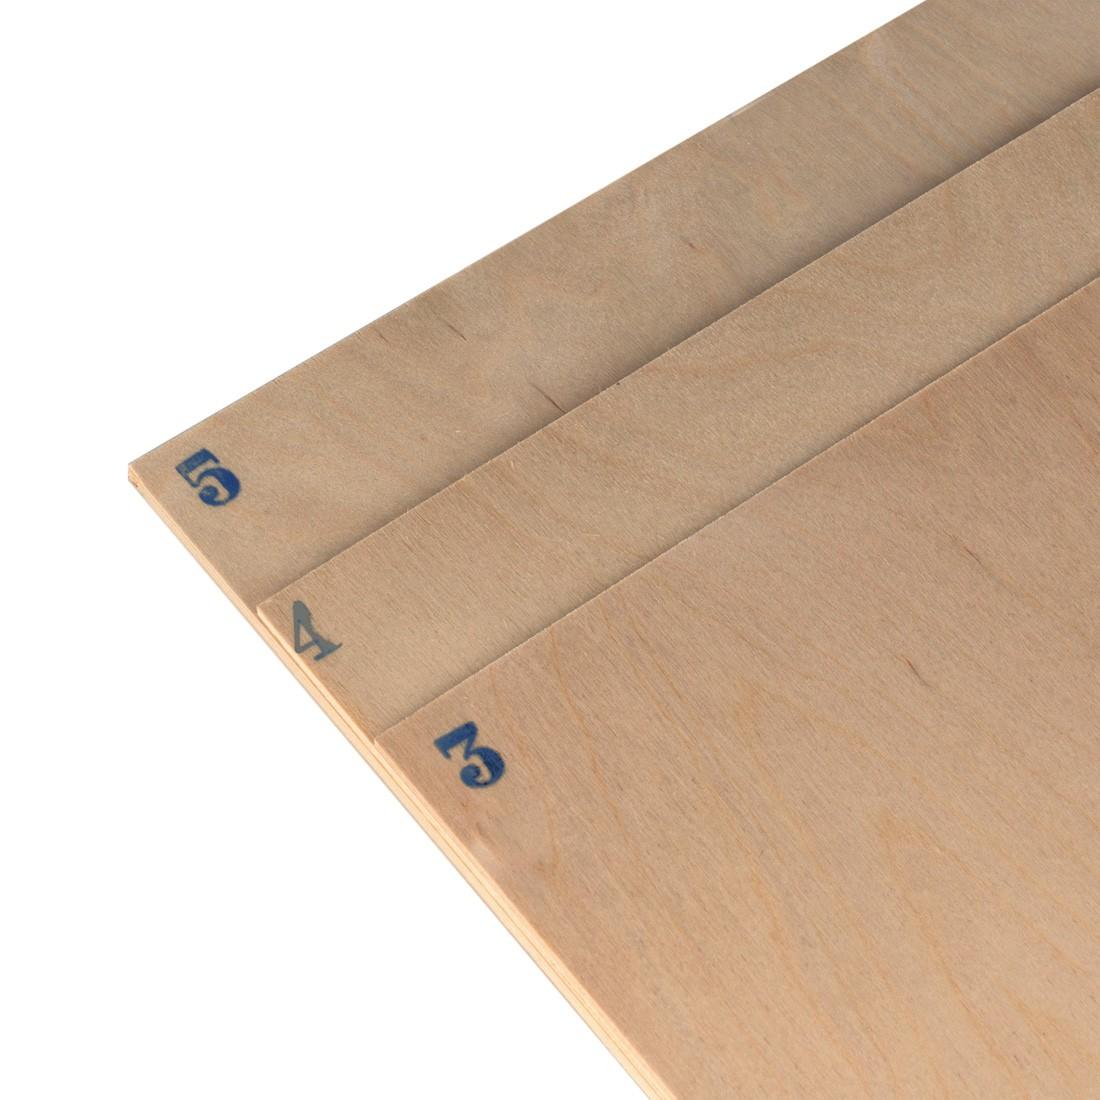 Abedul contrachapado mm.3 cm.50x38